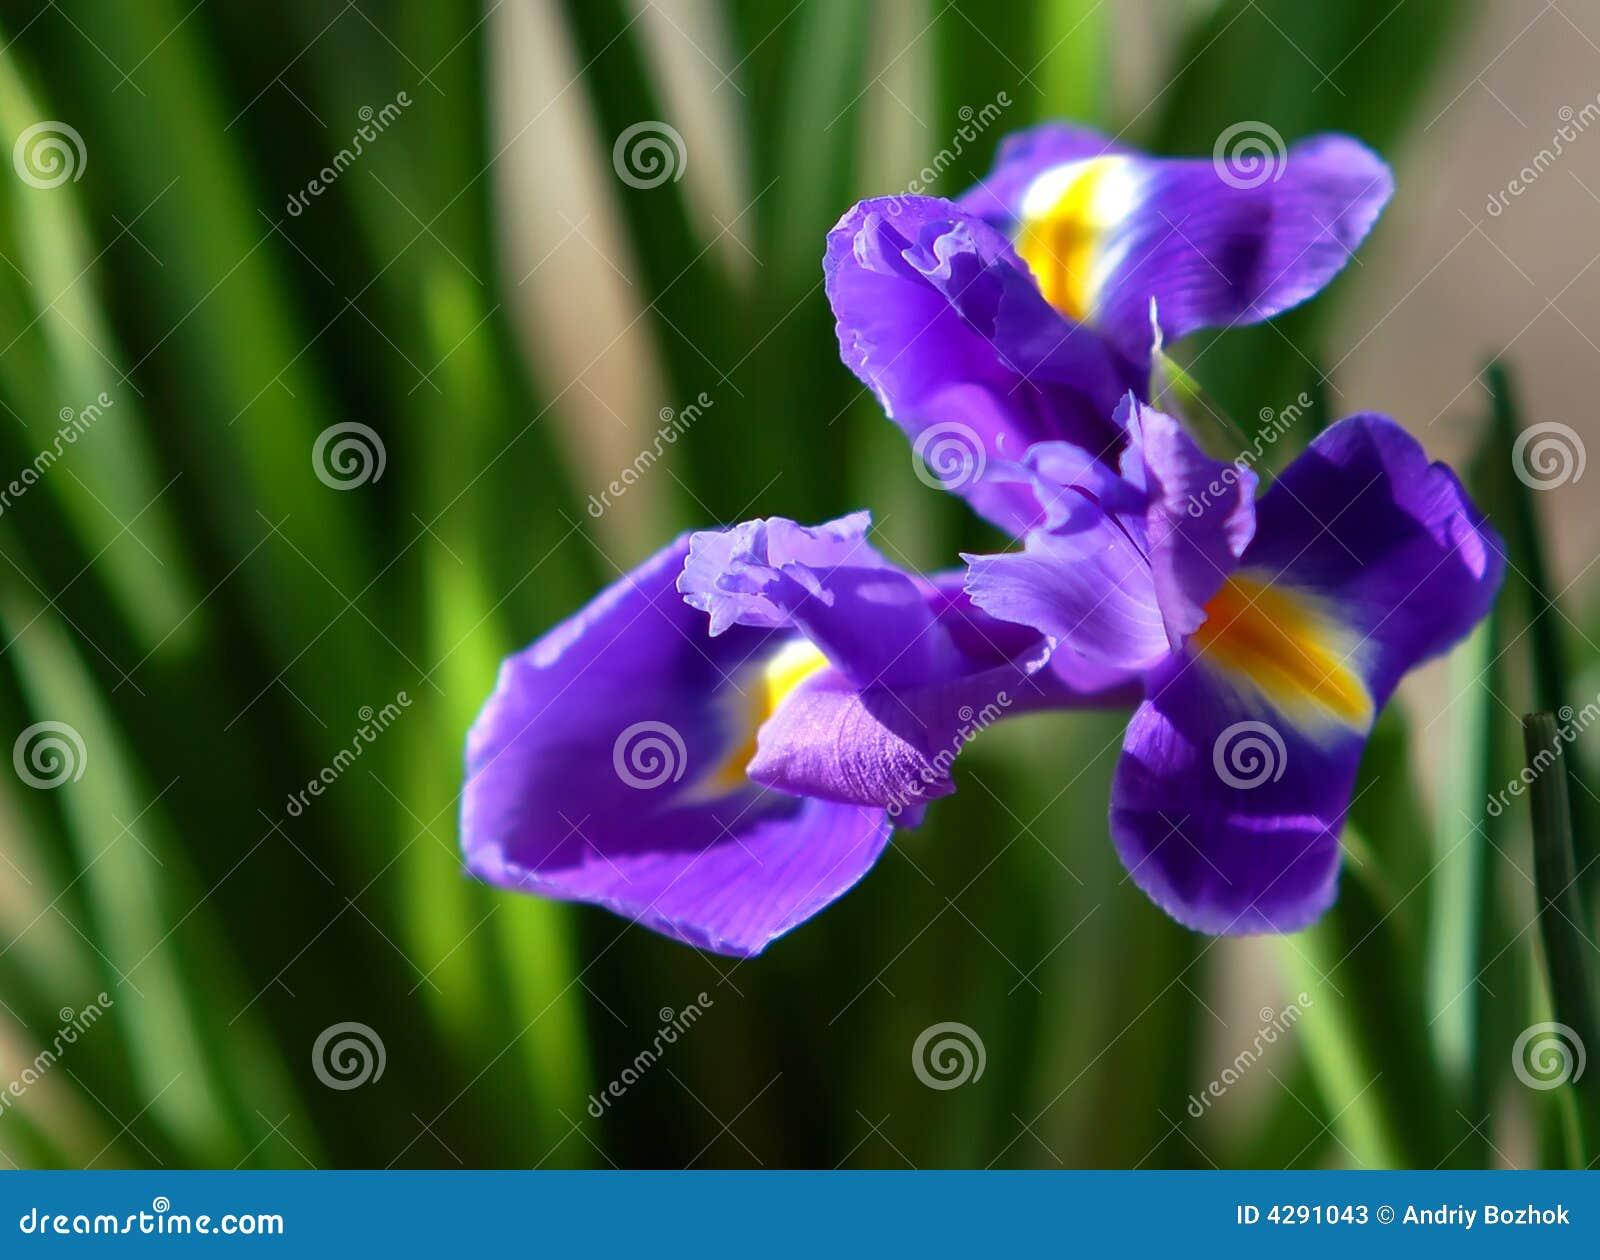 iris blume stockbild bild von gr n farbe violett purpurrot 4291043. Black Bedroom Furniture Sets. Home Design Ideas